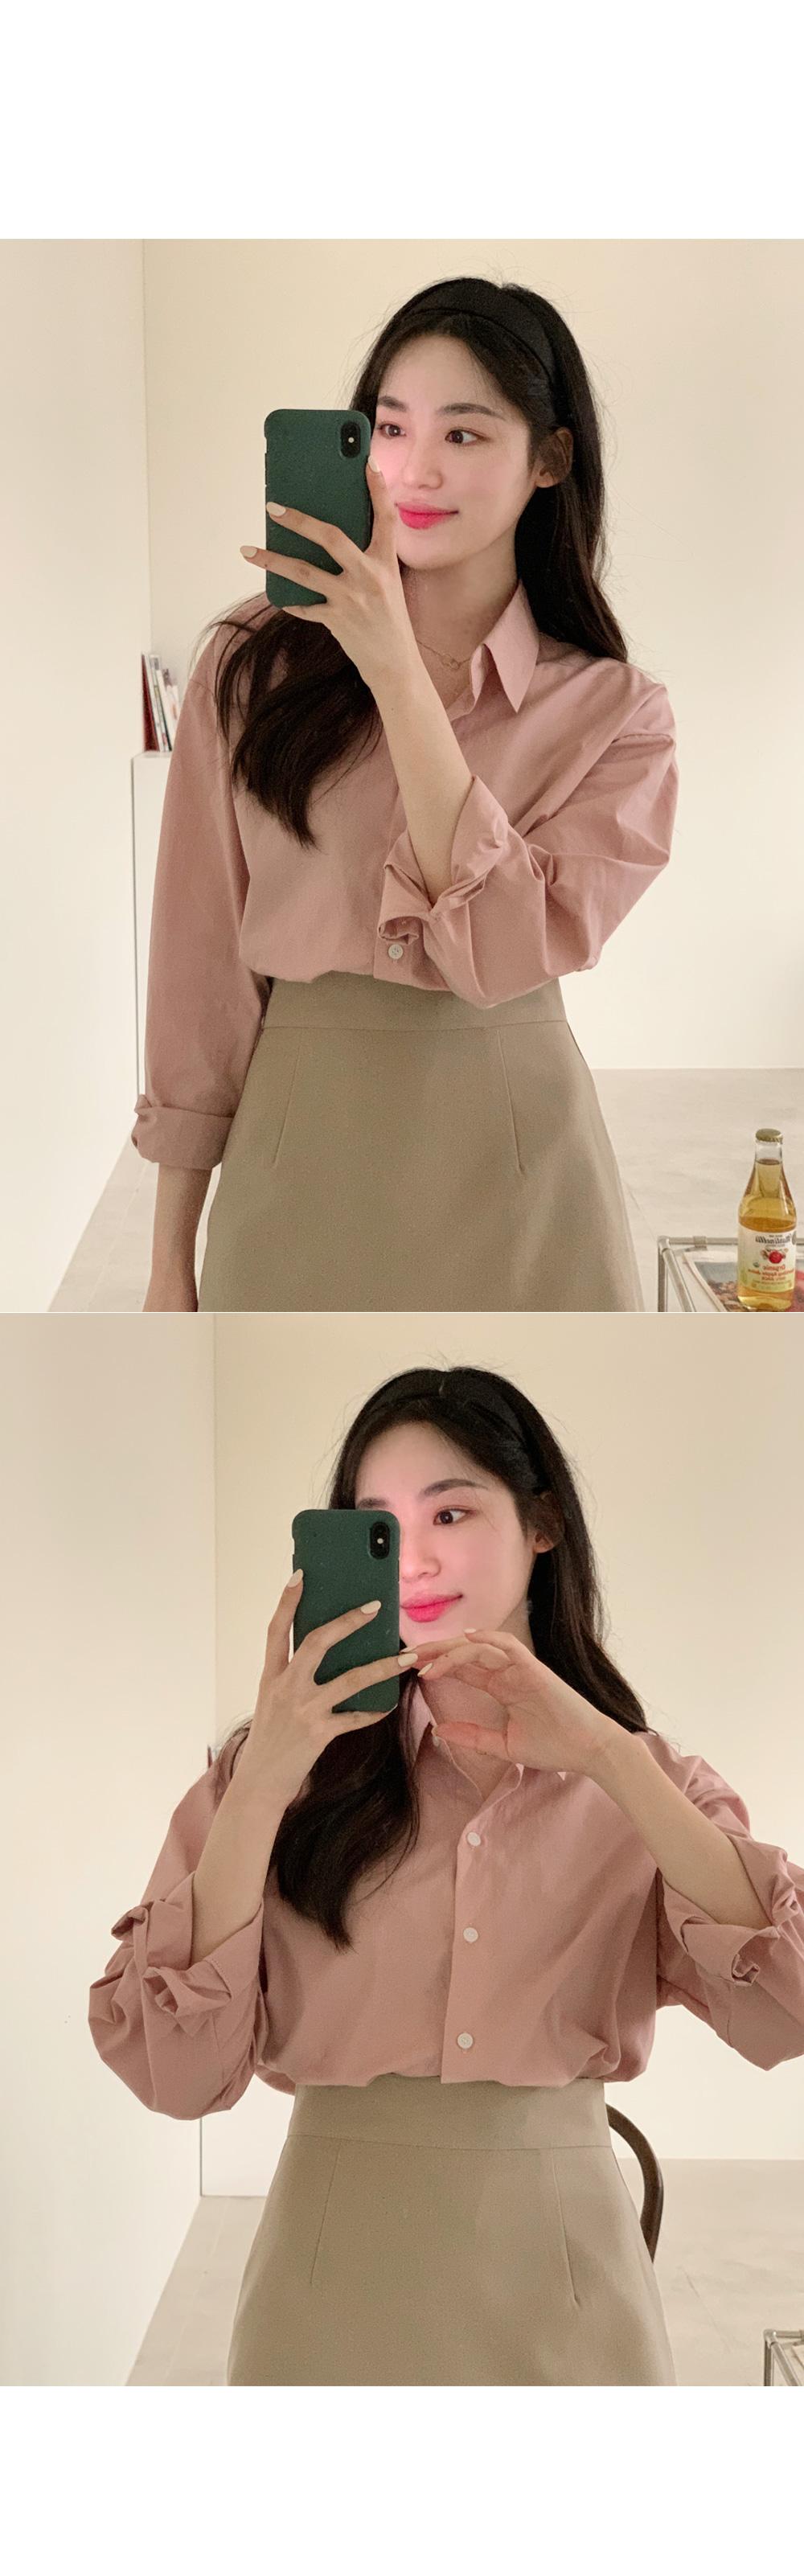 marro mini skirt